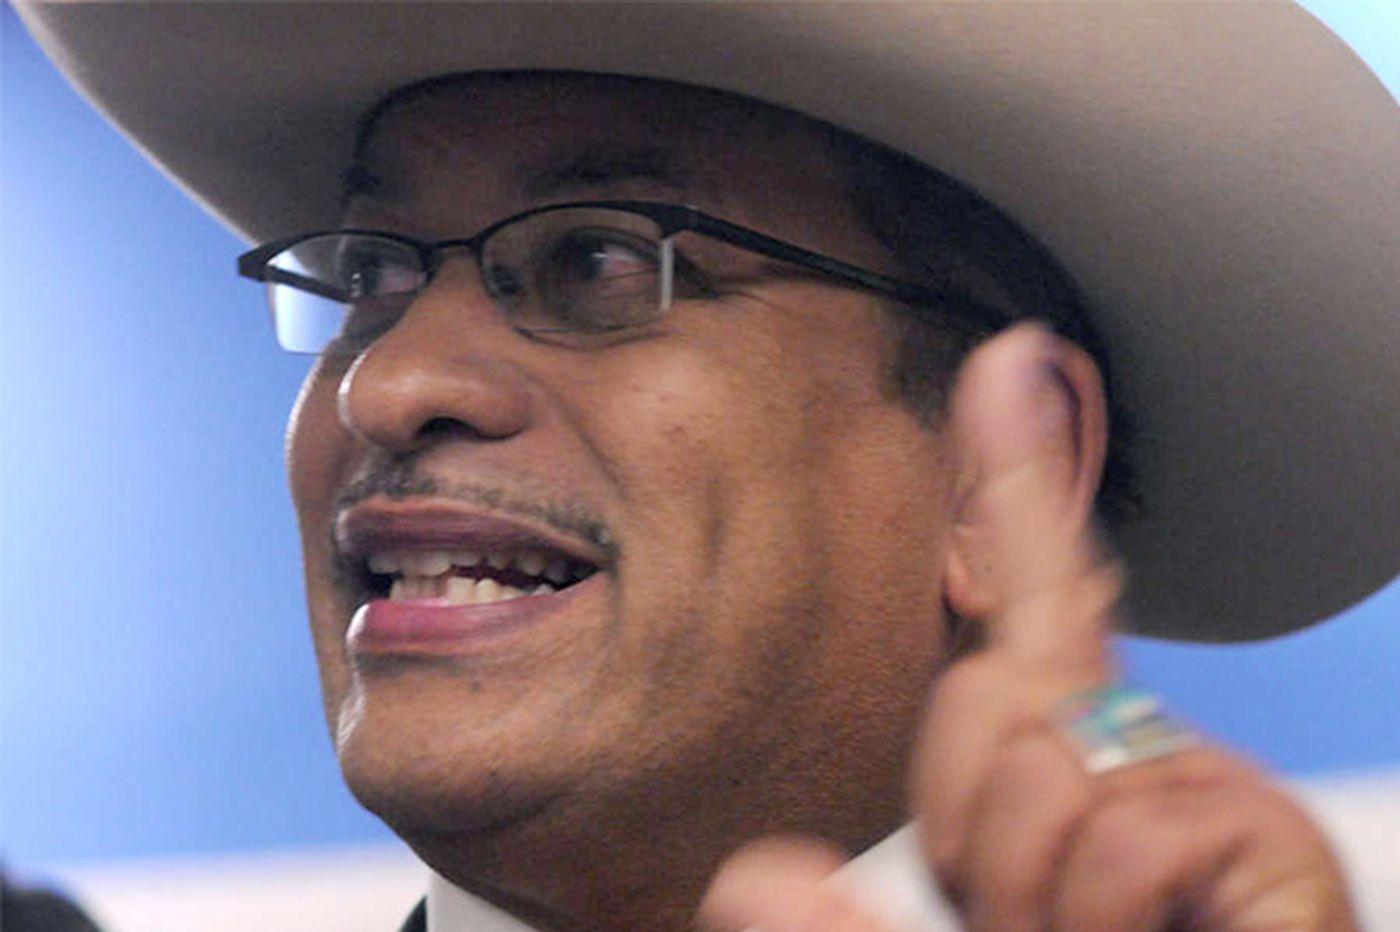 Philly civil rights leader J. Whyatt Mondesire dies at 65